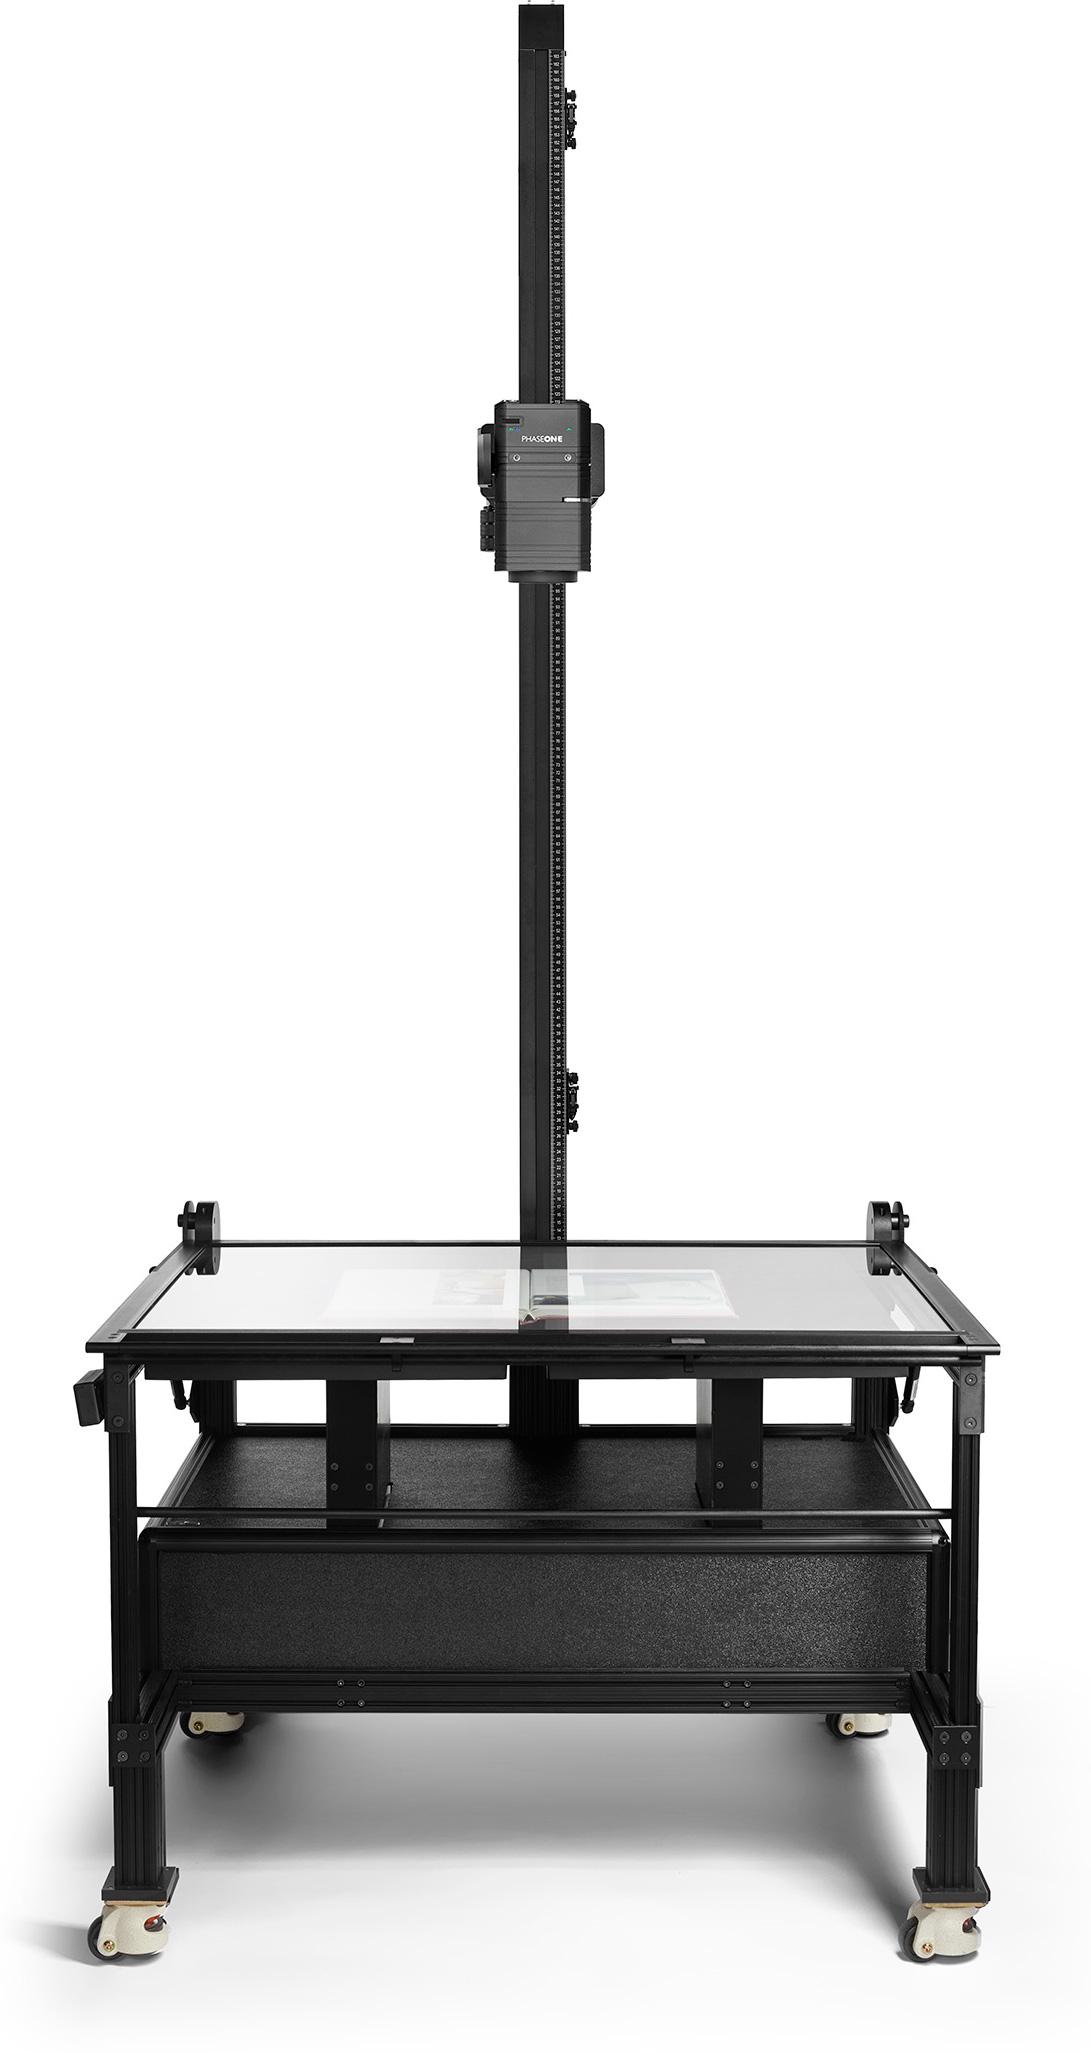 iXH-150MP-Versa-Mockup-cropped